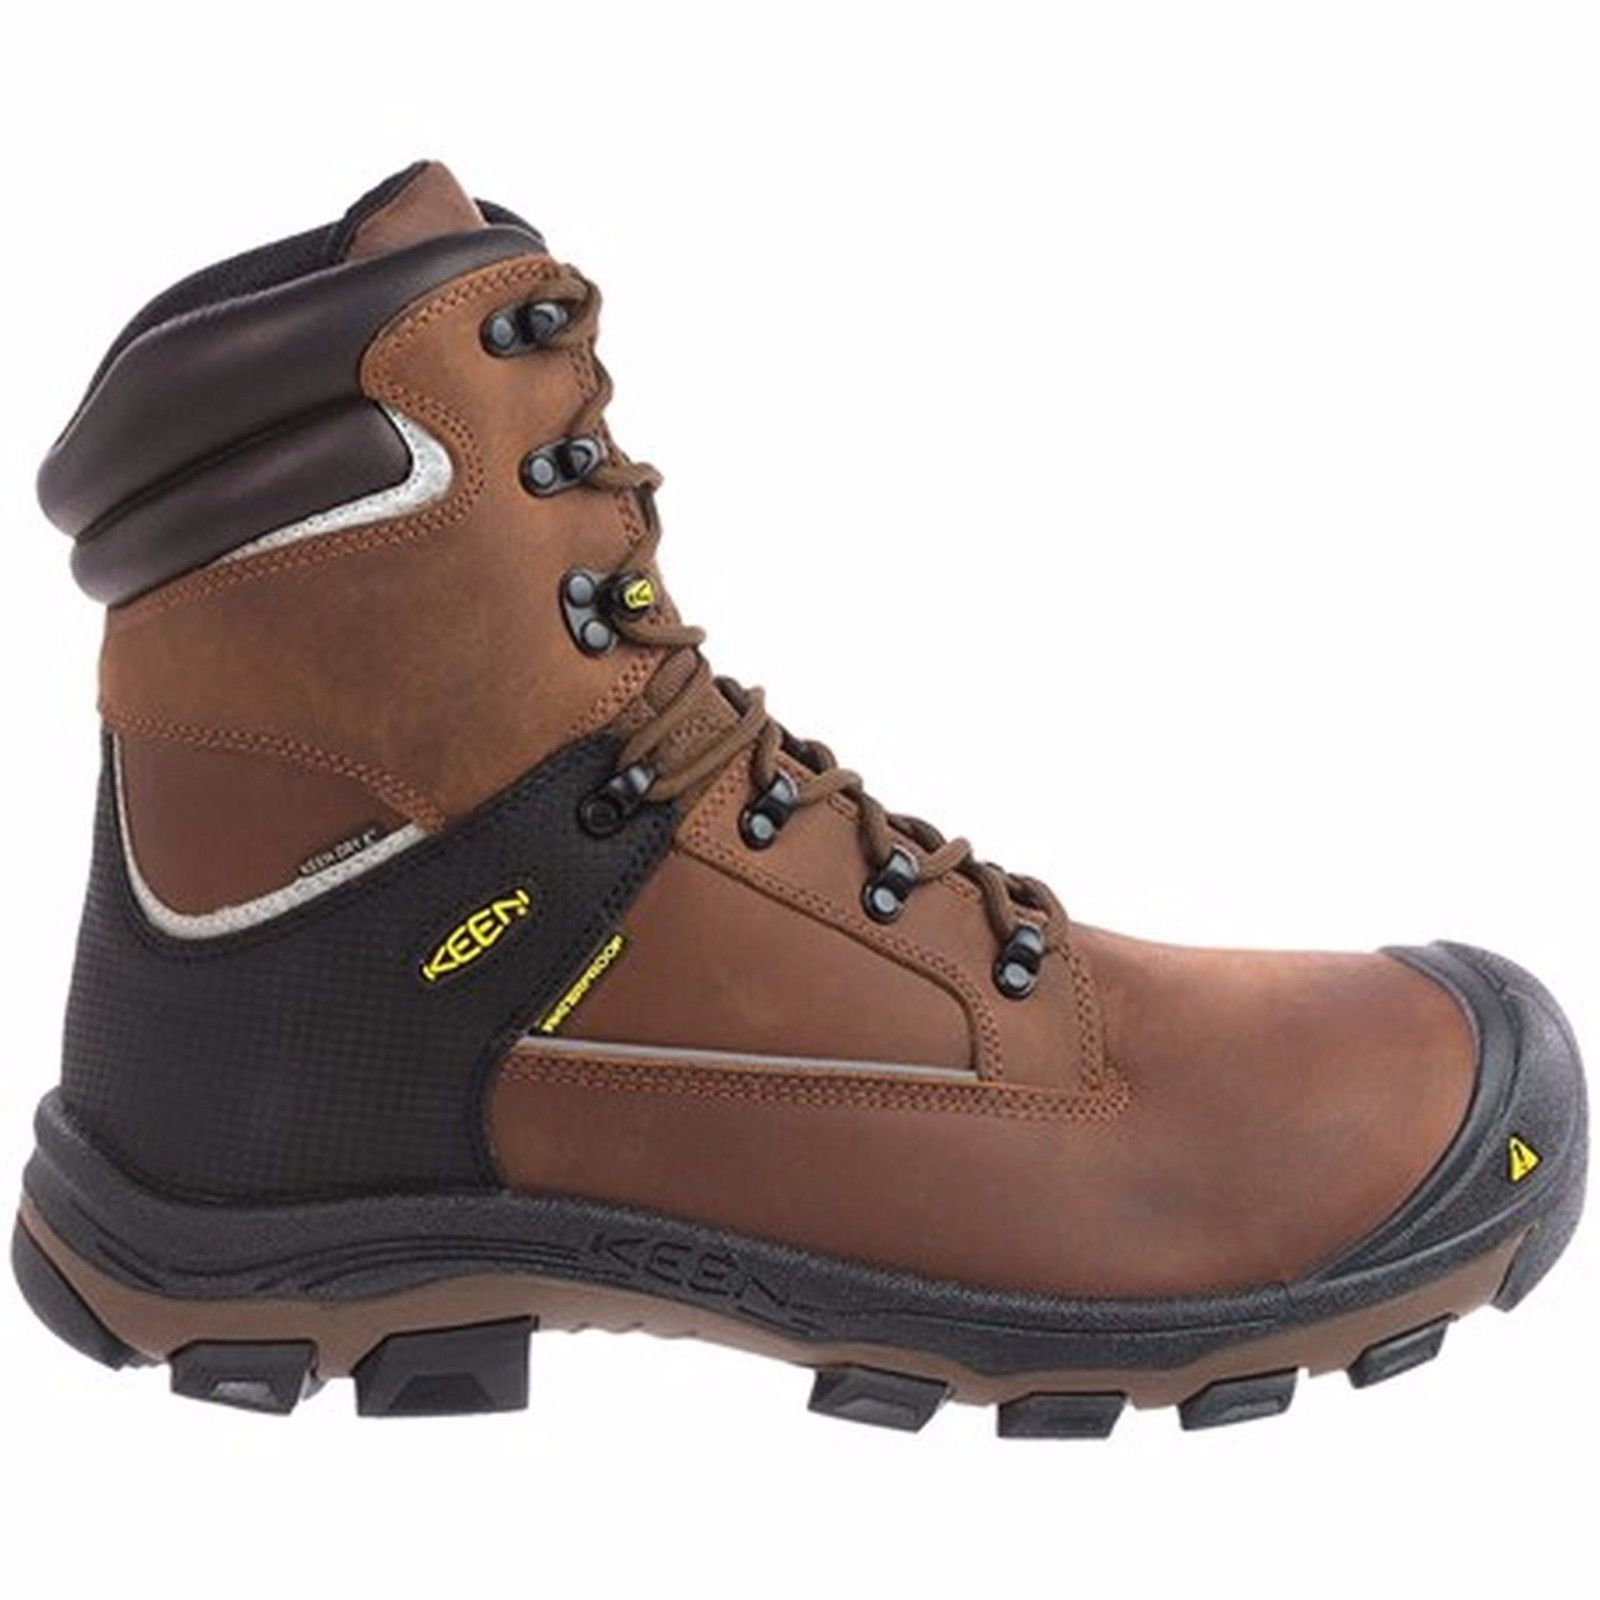 Keen portland pr 8 size 14ee work boots waterproof